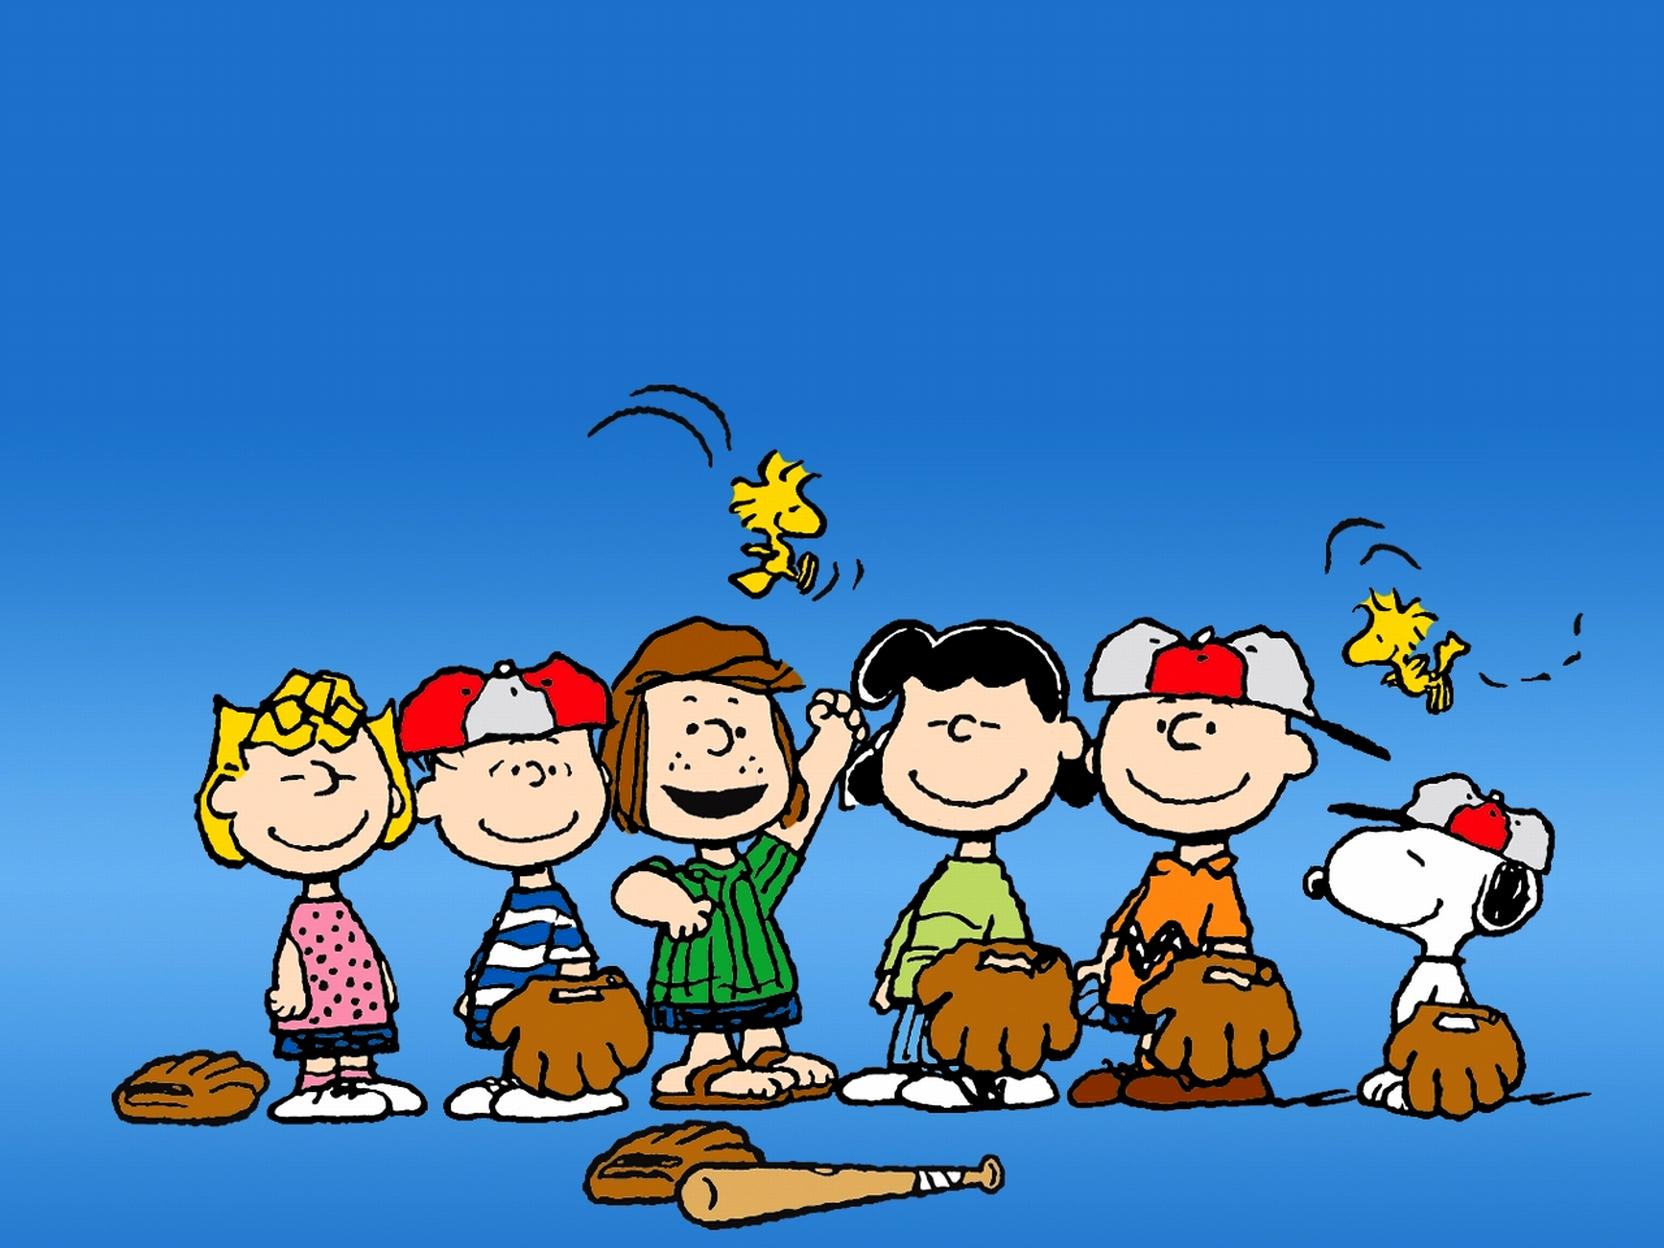 peanuts wallpaper,animated cartoon,cartoon,people,animation,child